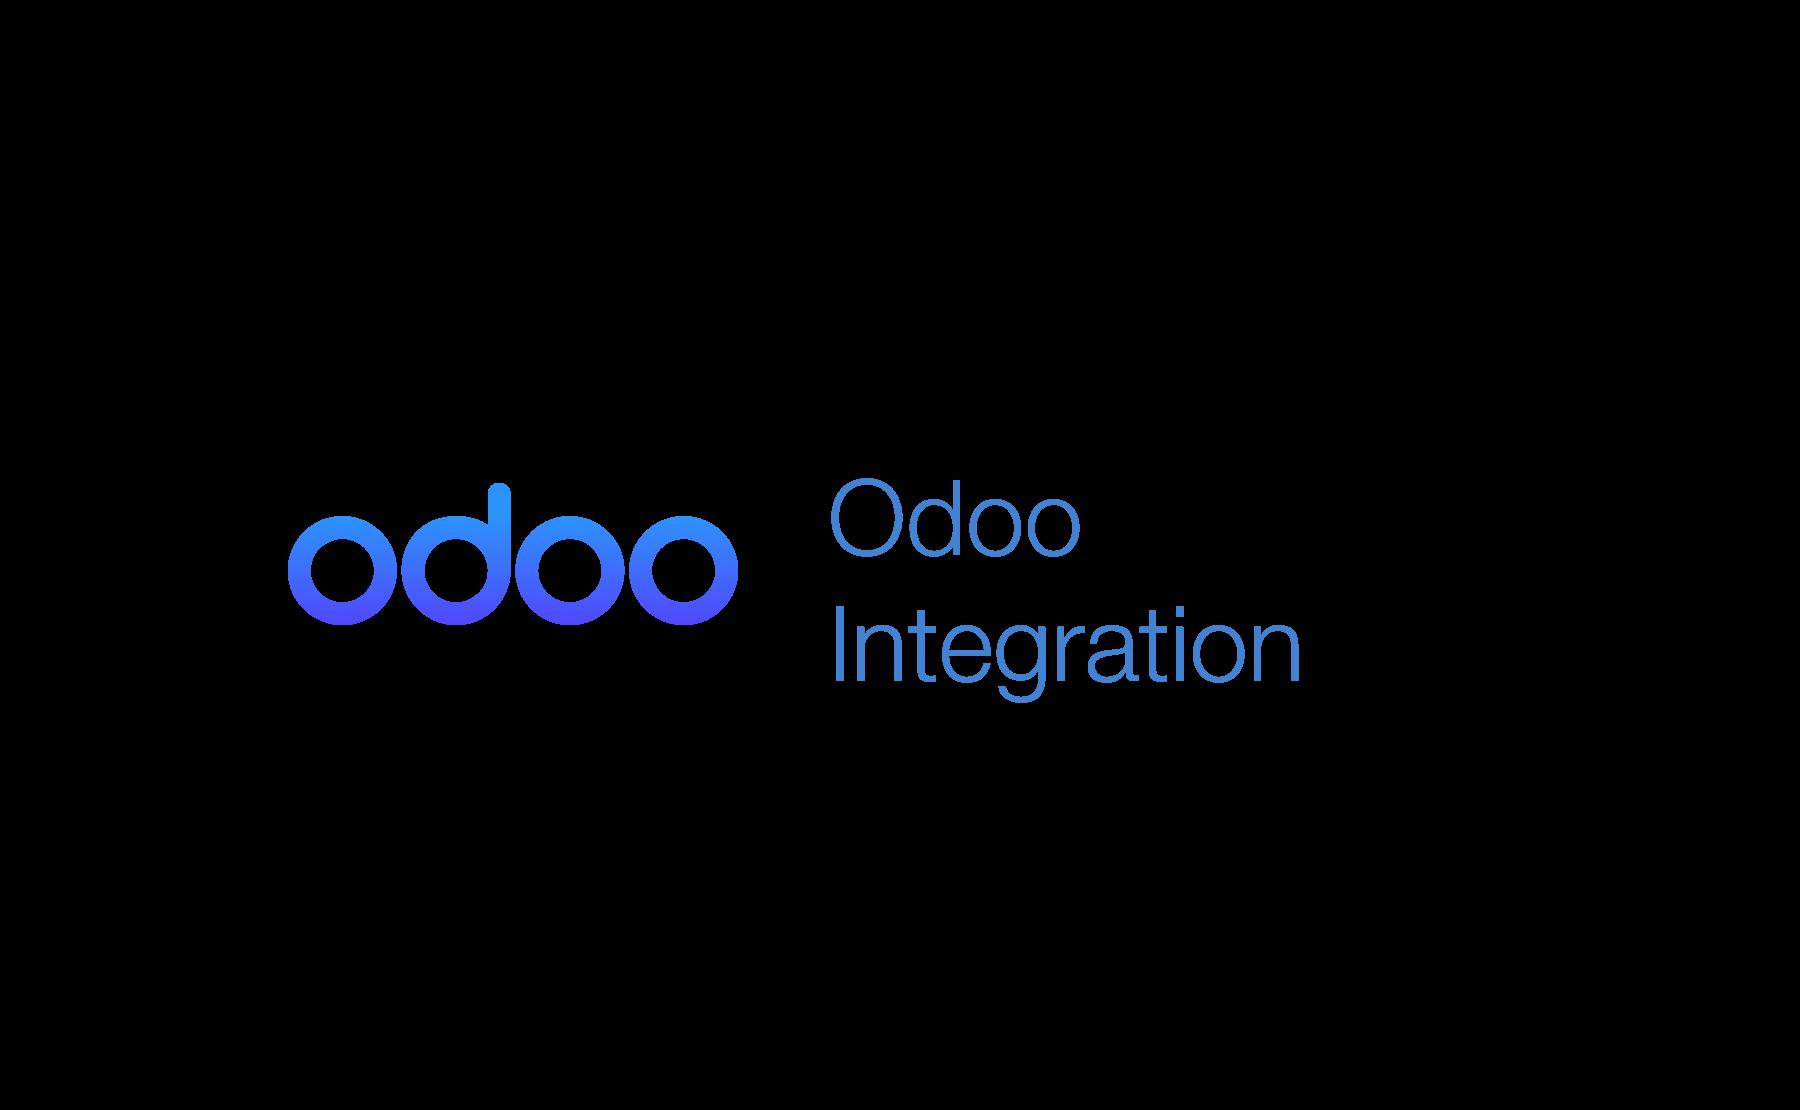 Odoo Integration